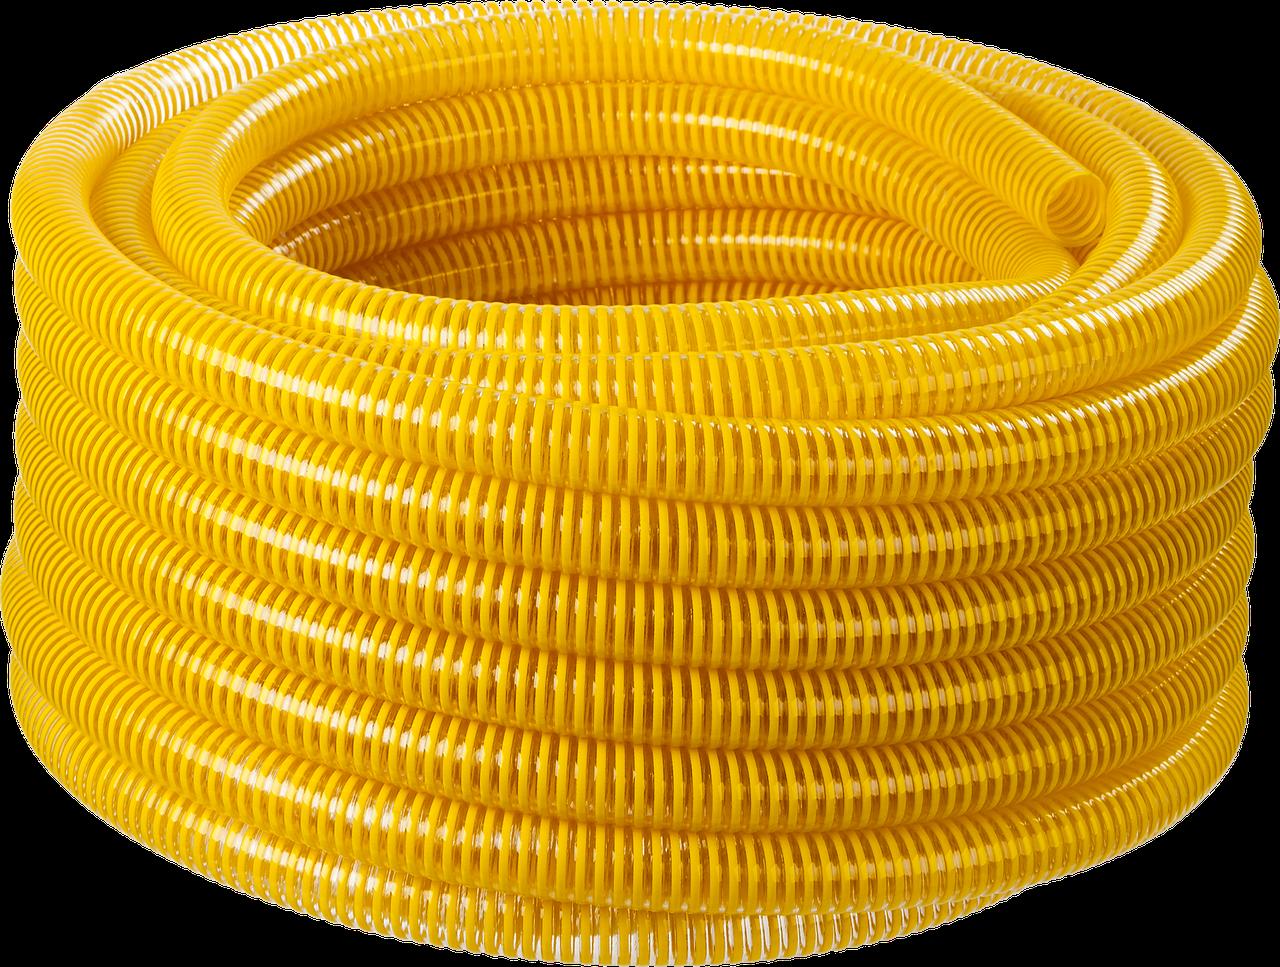 ЗУБР Шланг напорно-всасывающий со спиралью ПВХ, 10 атм, 19мм х 15м 270, 25, 30